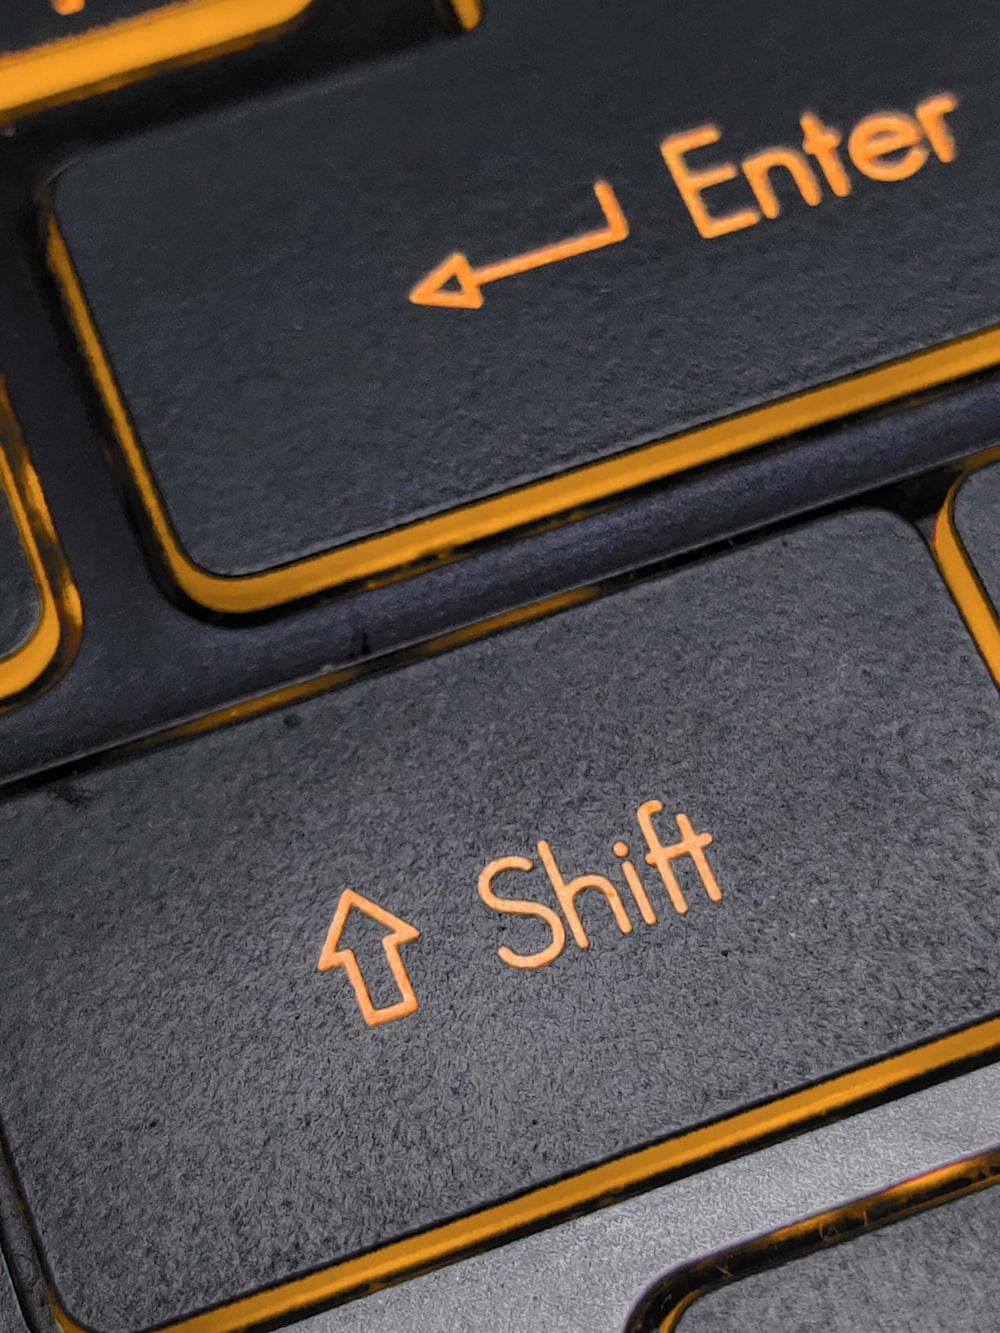 black and yellow computer keyboard